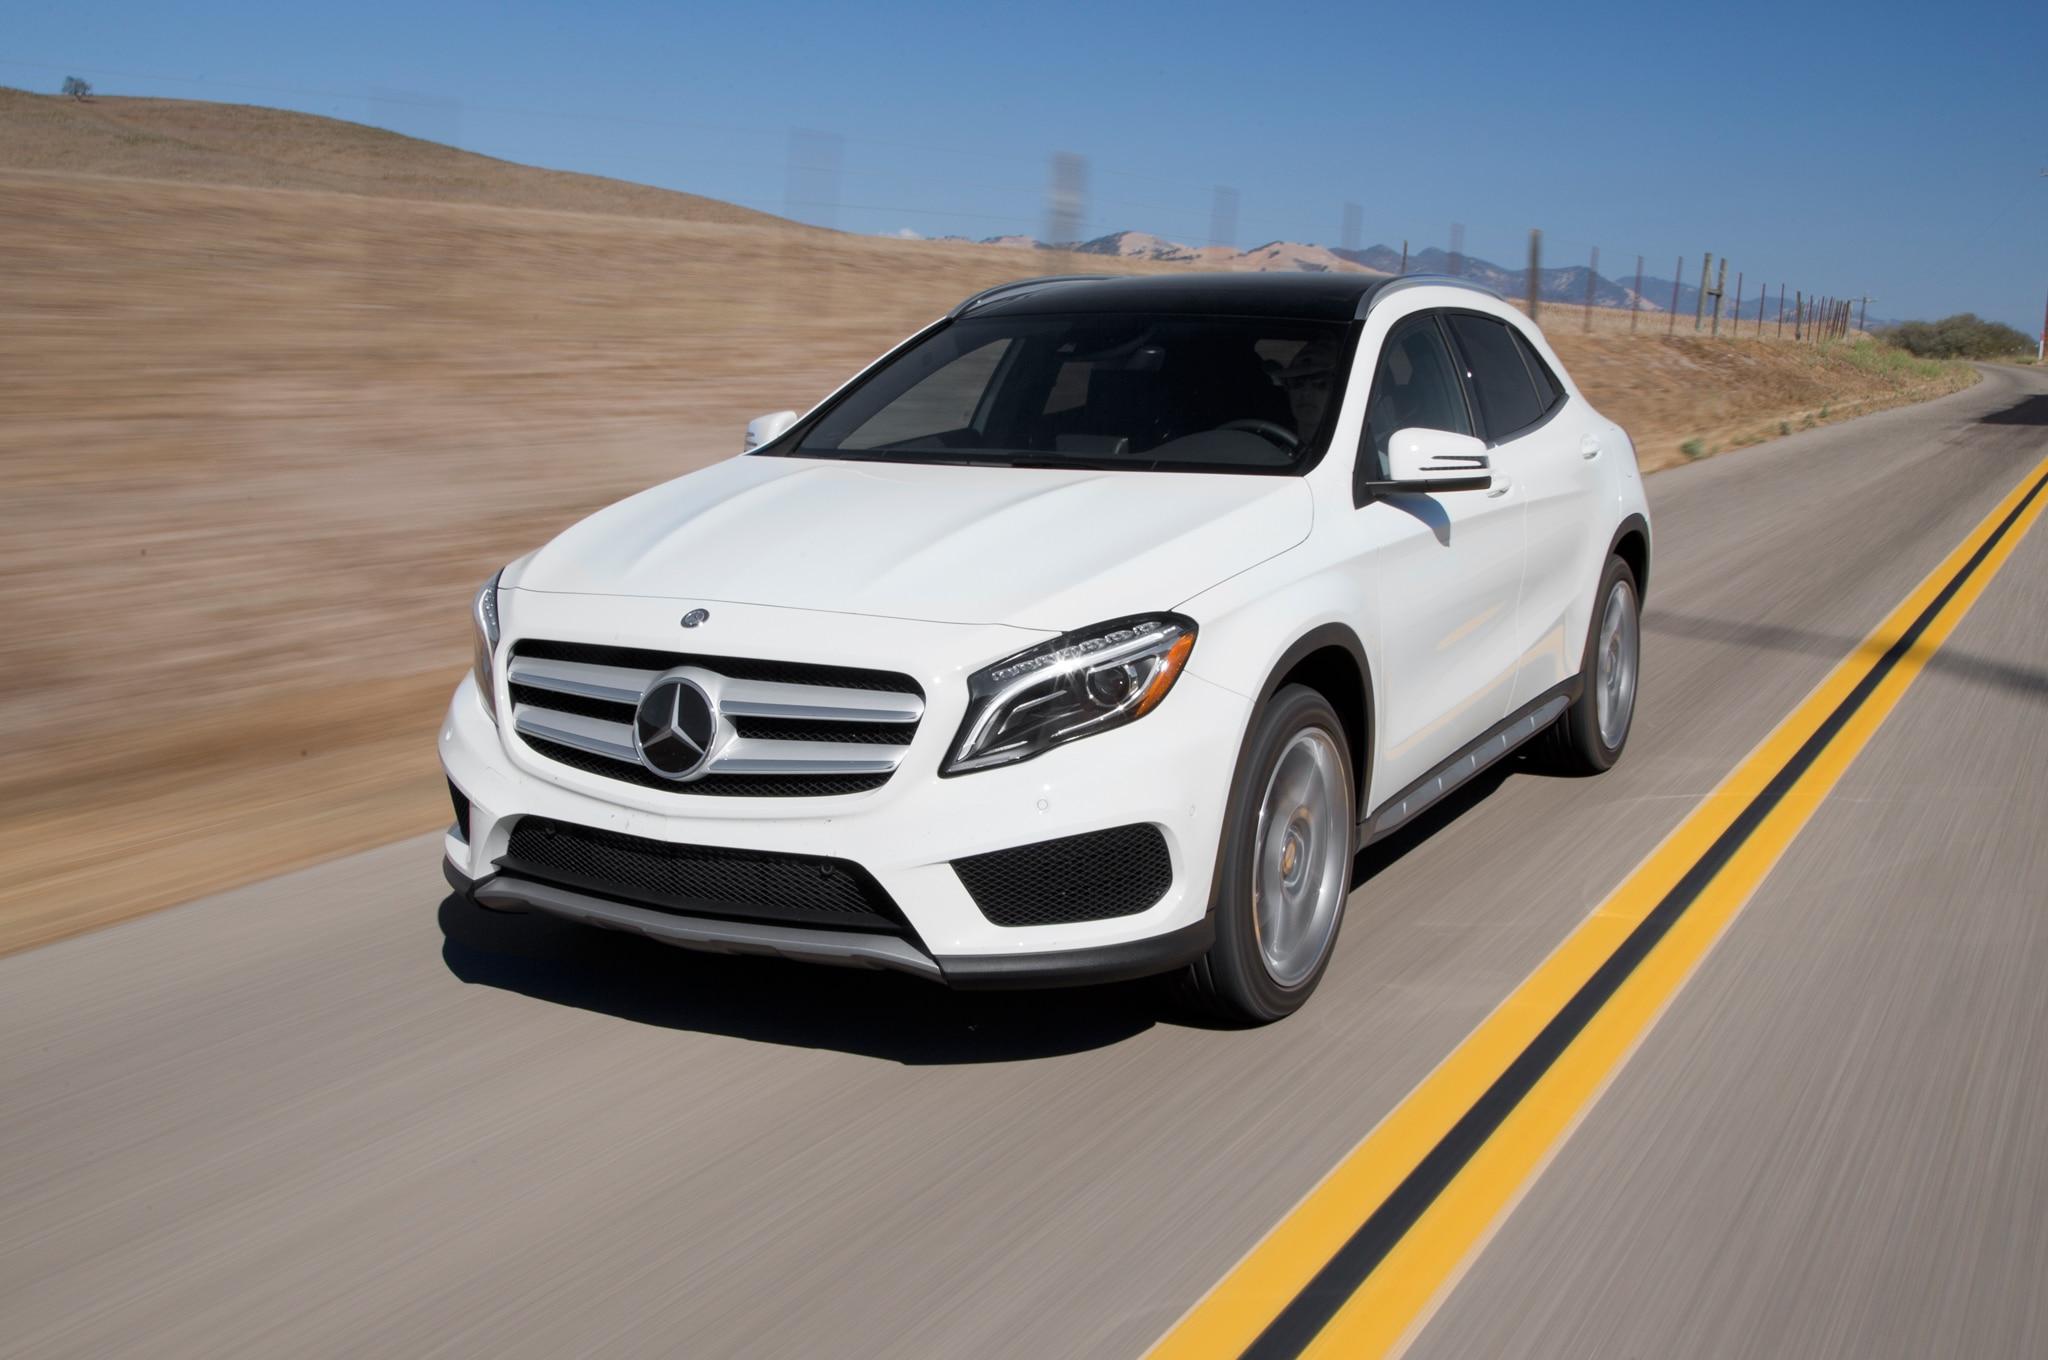 Mercedes benz gla250 4matic gla45 amg 2015 primera prueba for Mercedes benz greenway staff